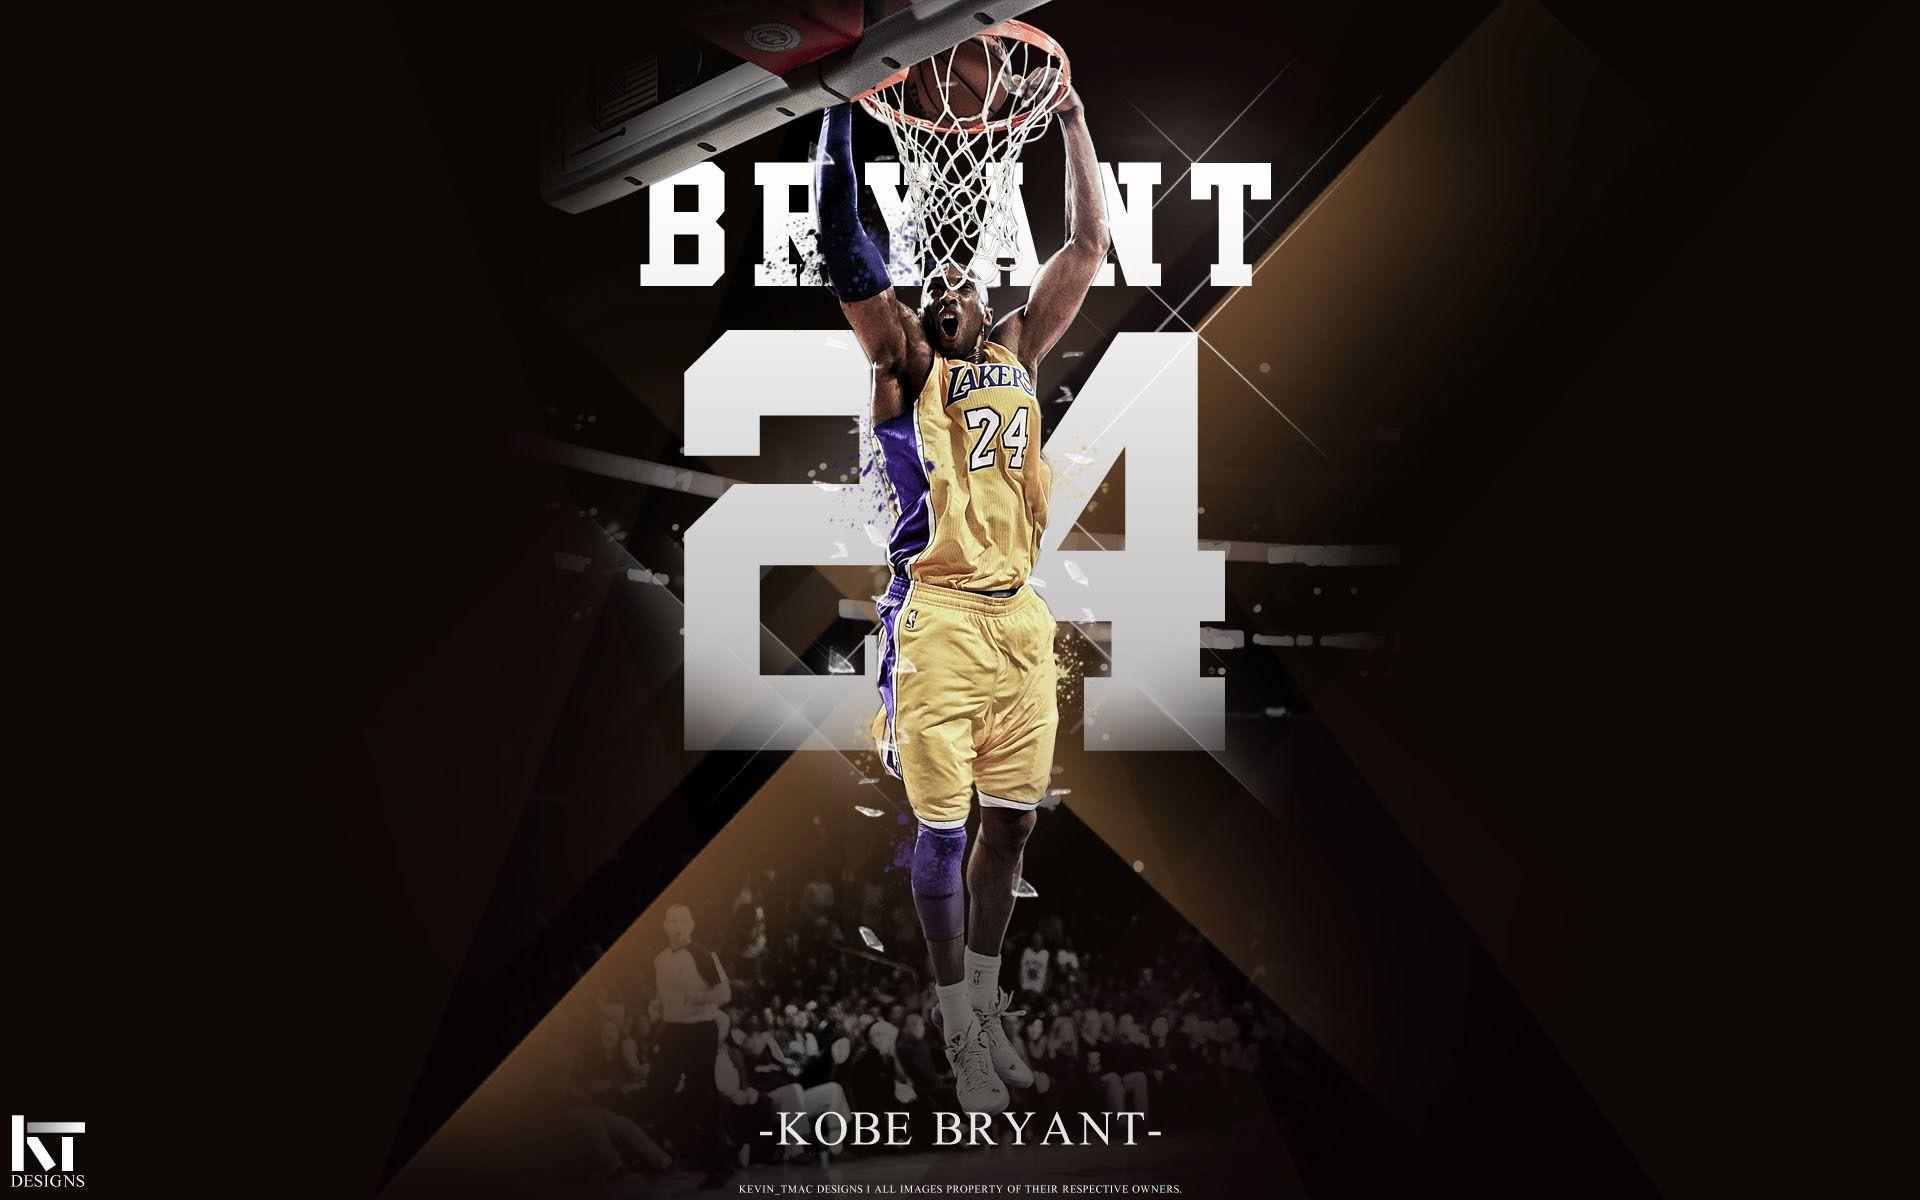 Kobe Bryant 24 Wallpaper 75 Pictures